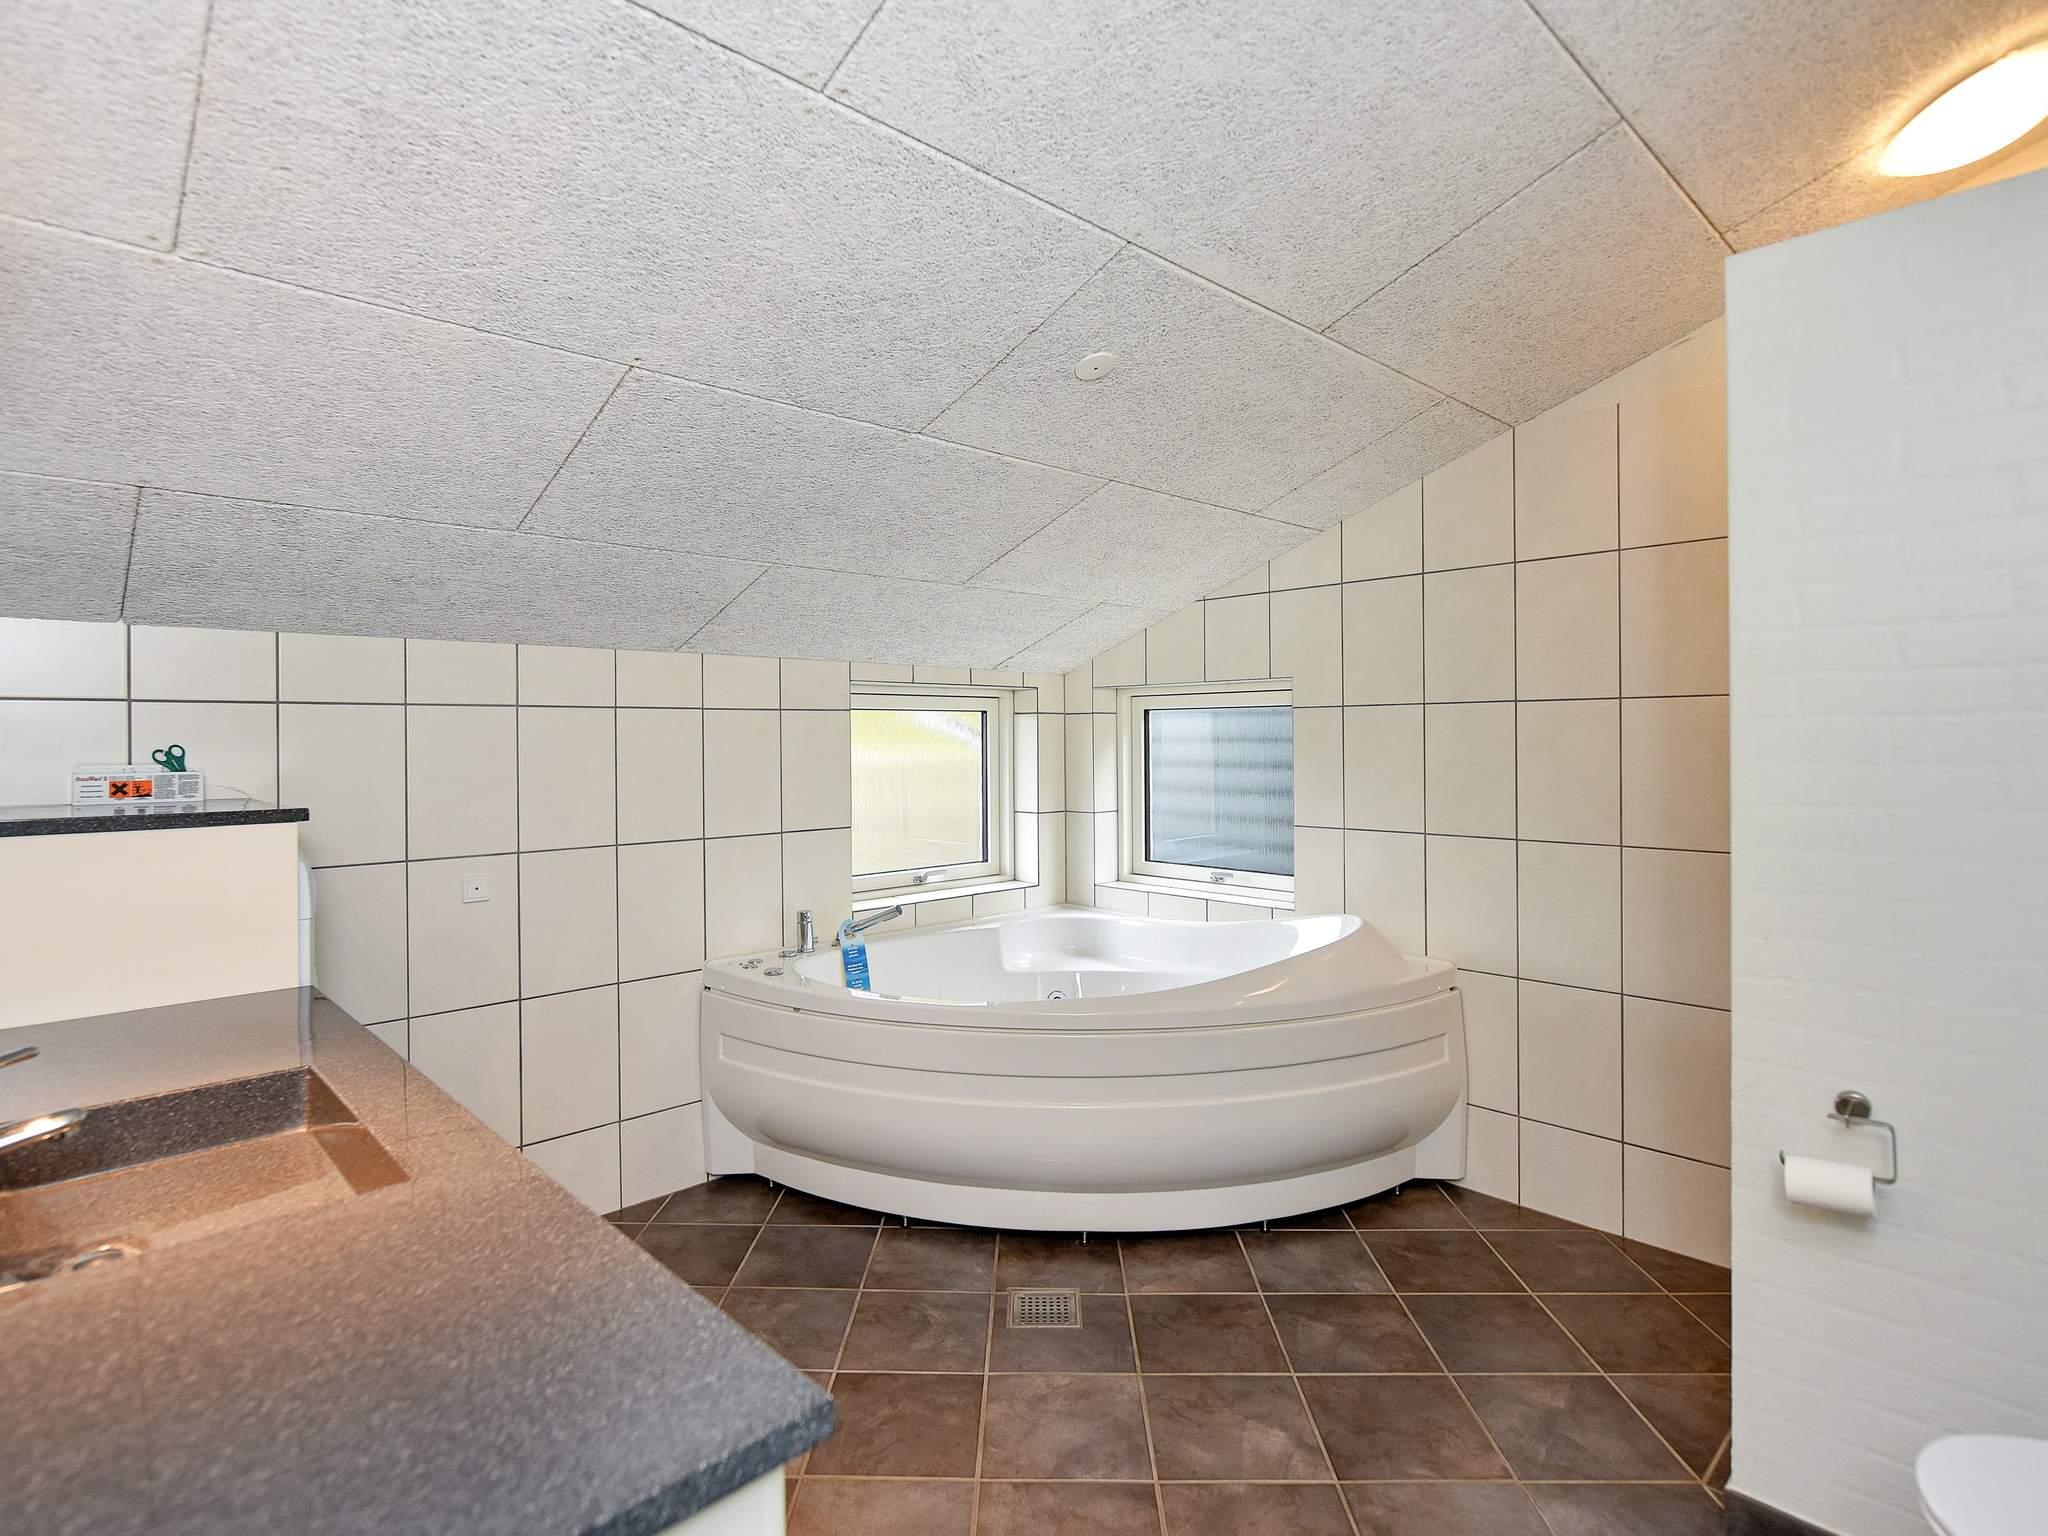 Ferienhaus Hovborg (404746), Hovborg, , Südwestjütland, Dänemark, Bild 13